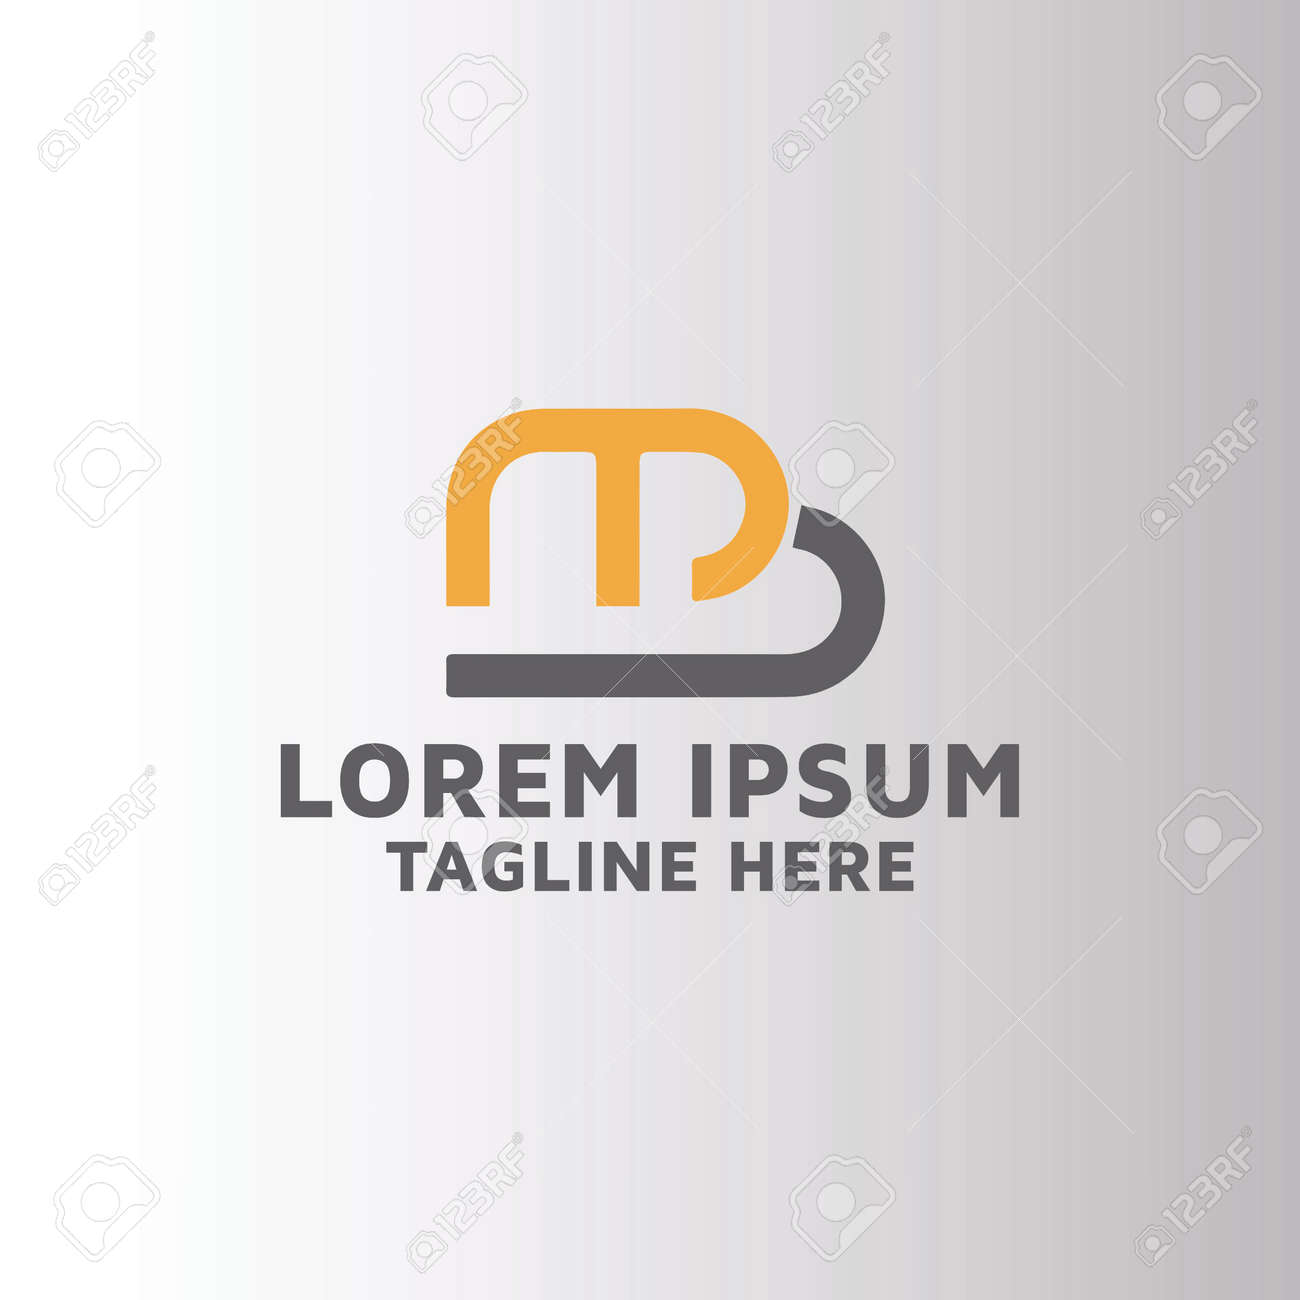 Letter W image, fitness vector logo design idea - 159961069